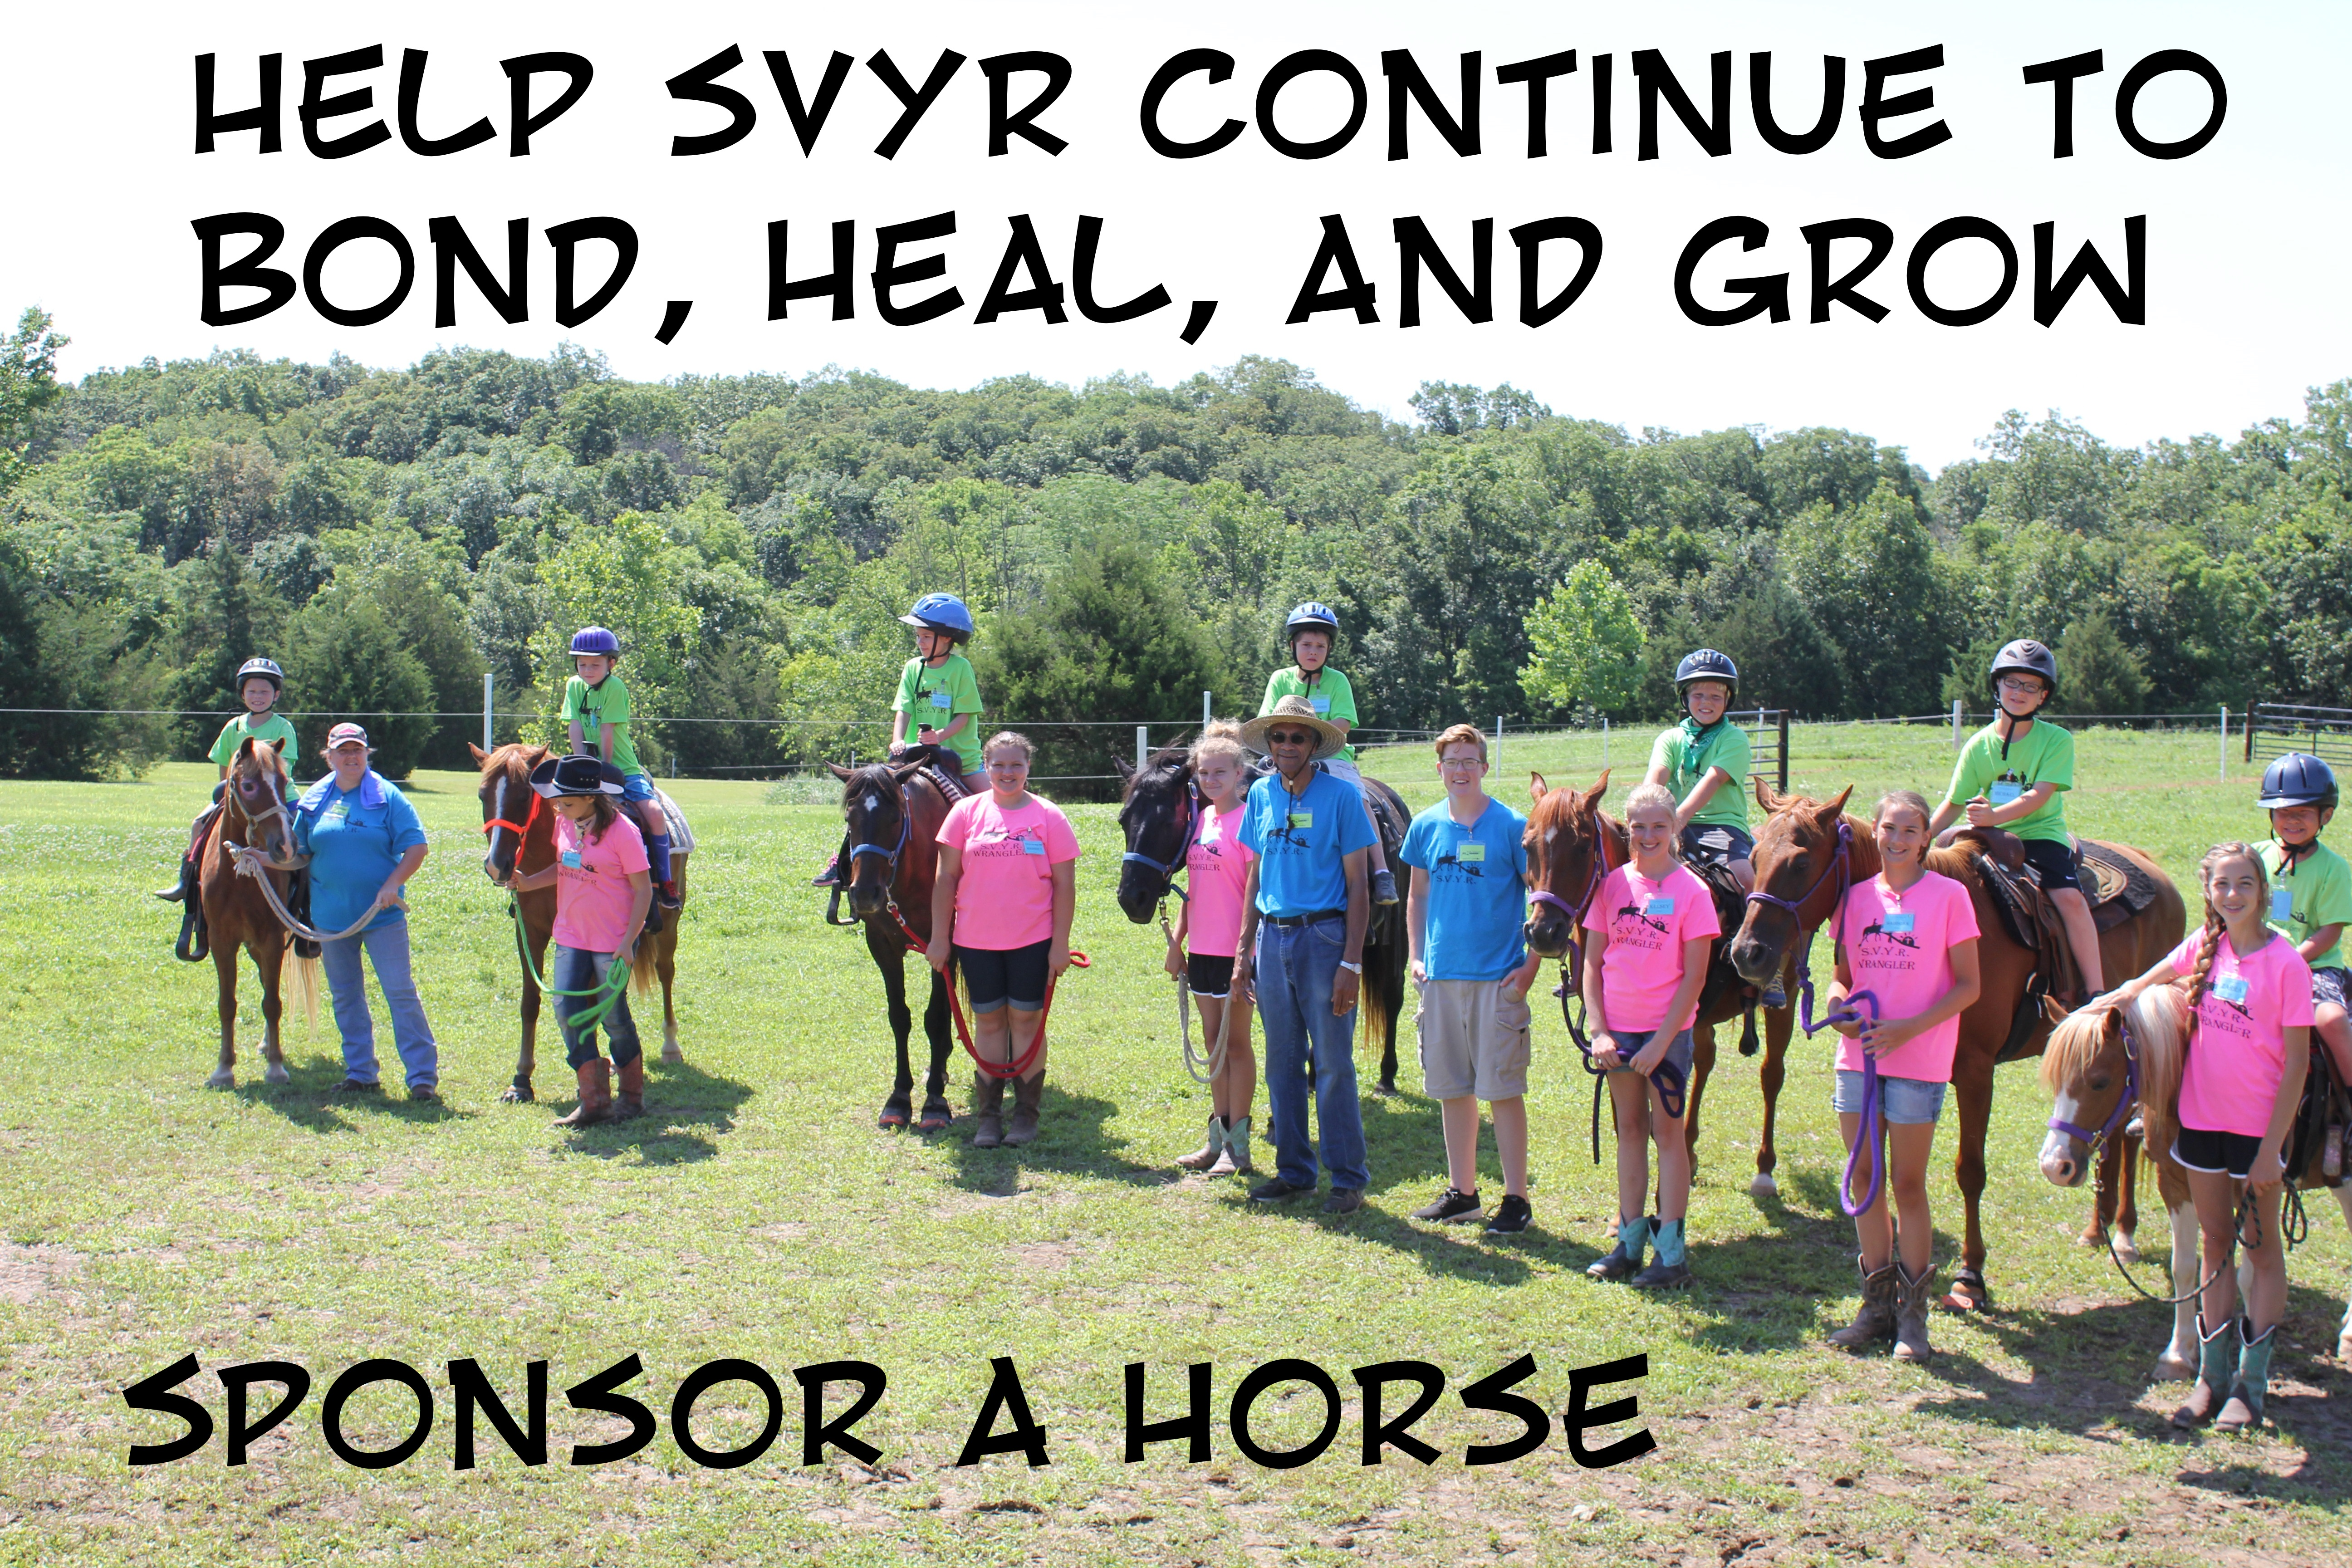 sponsor-a-horse